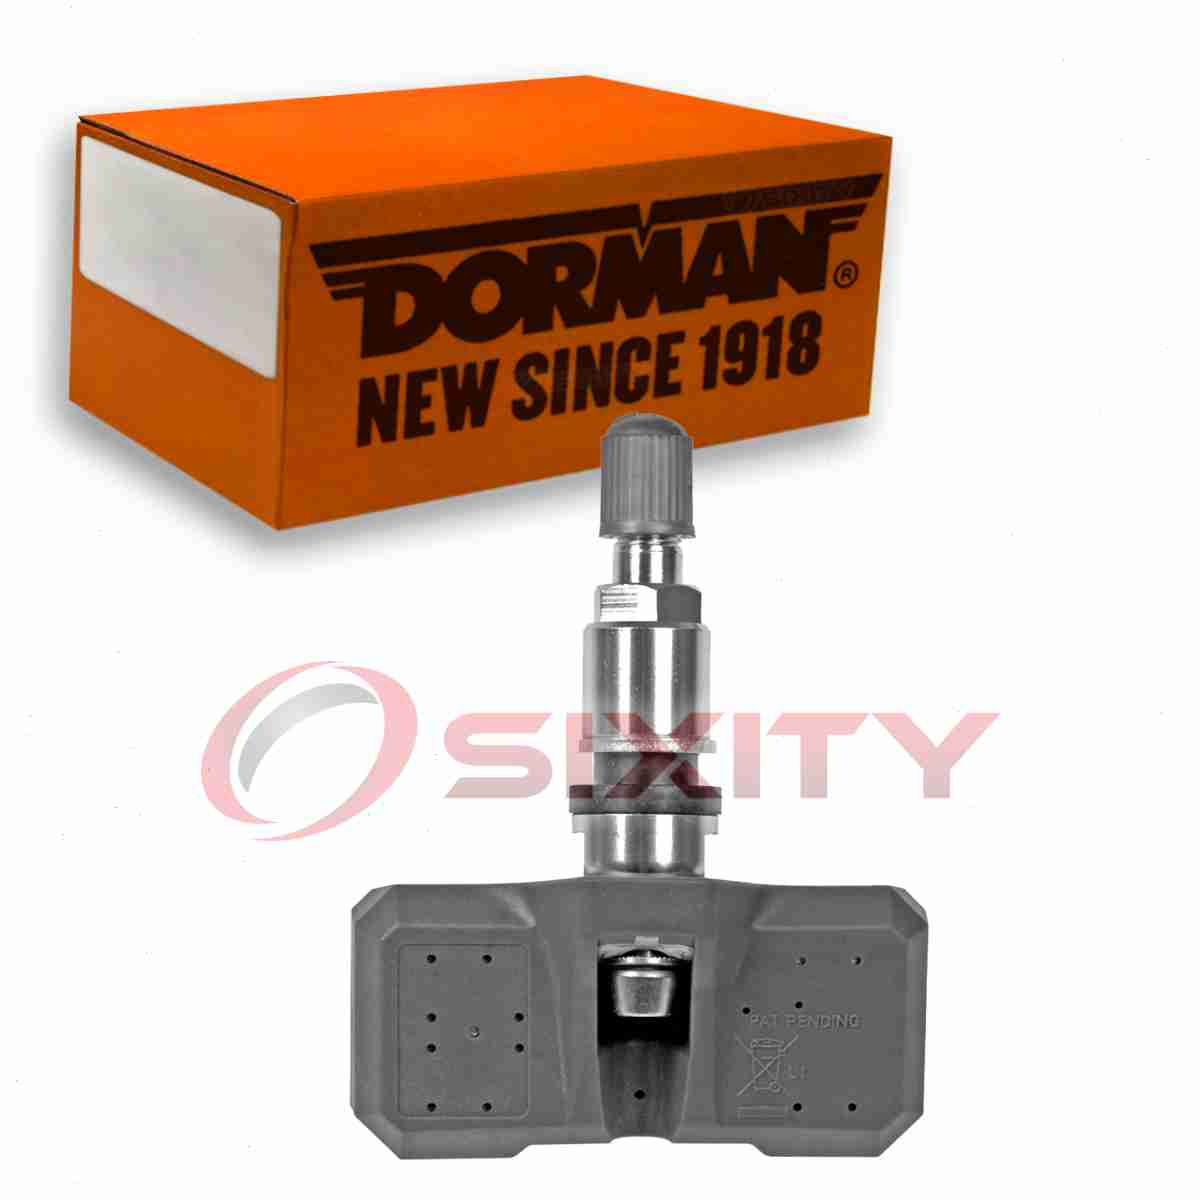 Dorman TPMS Programmable Sensor for Acura TL 2006-2012 Tire Pressure bb